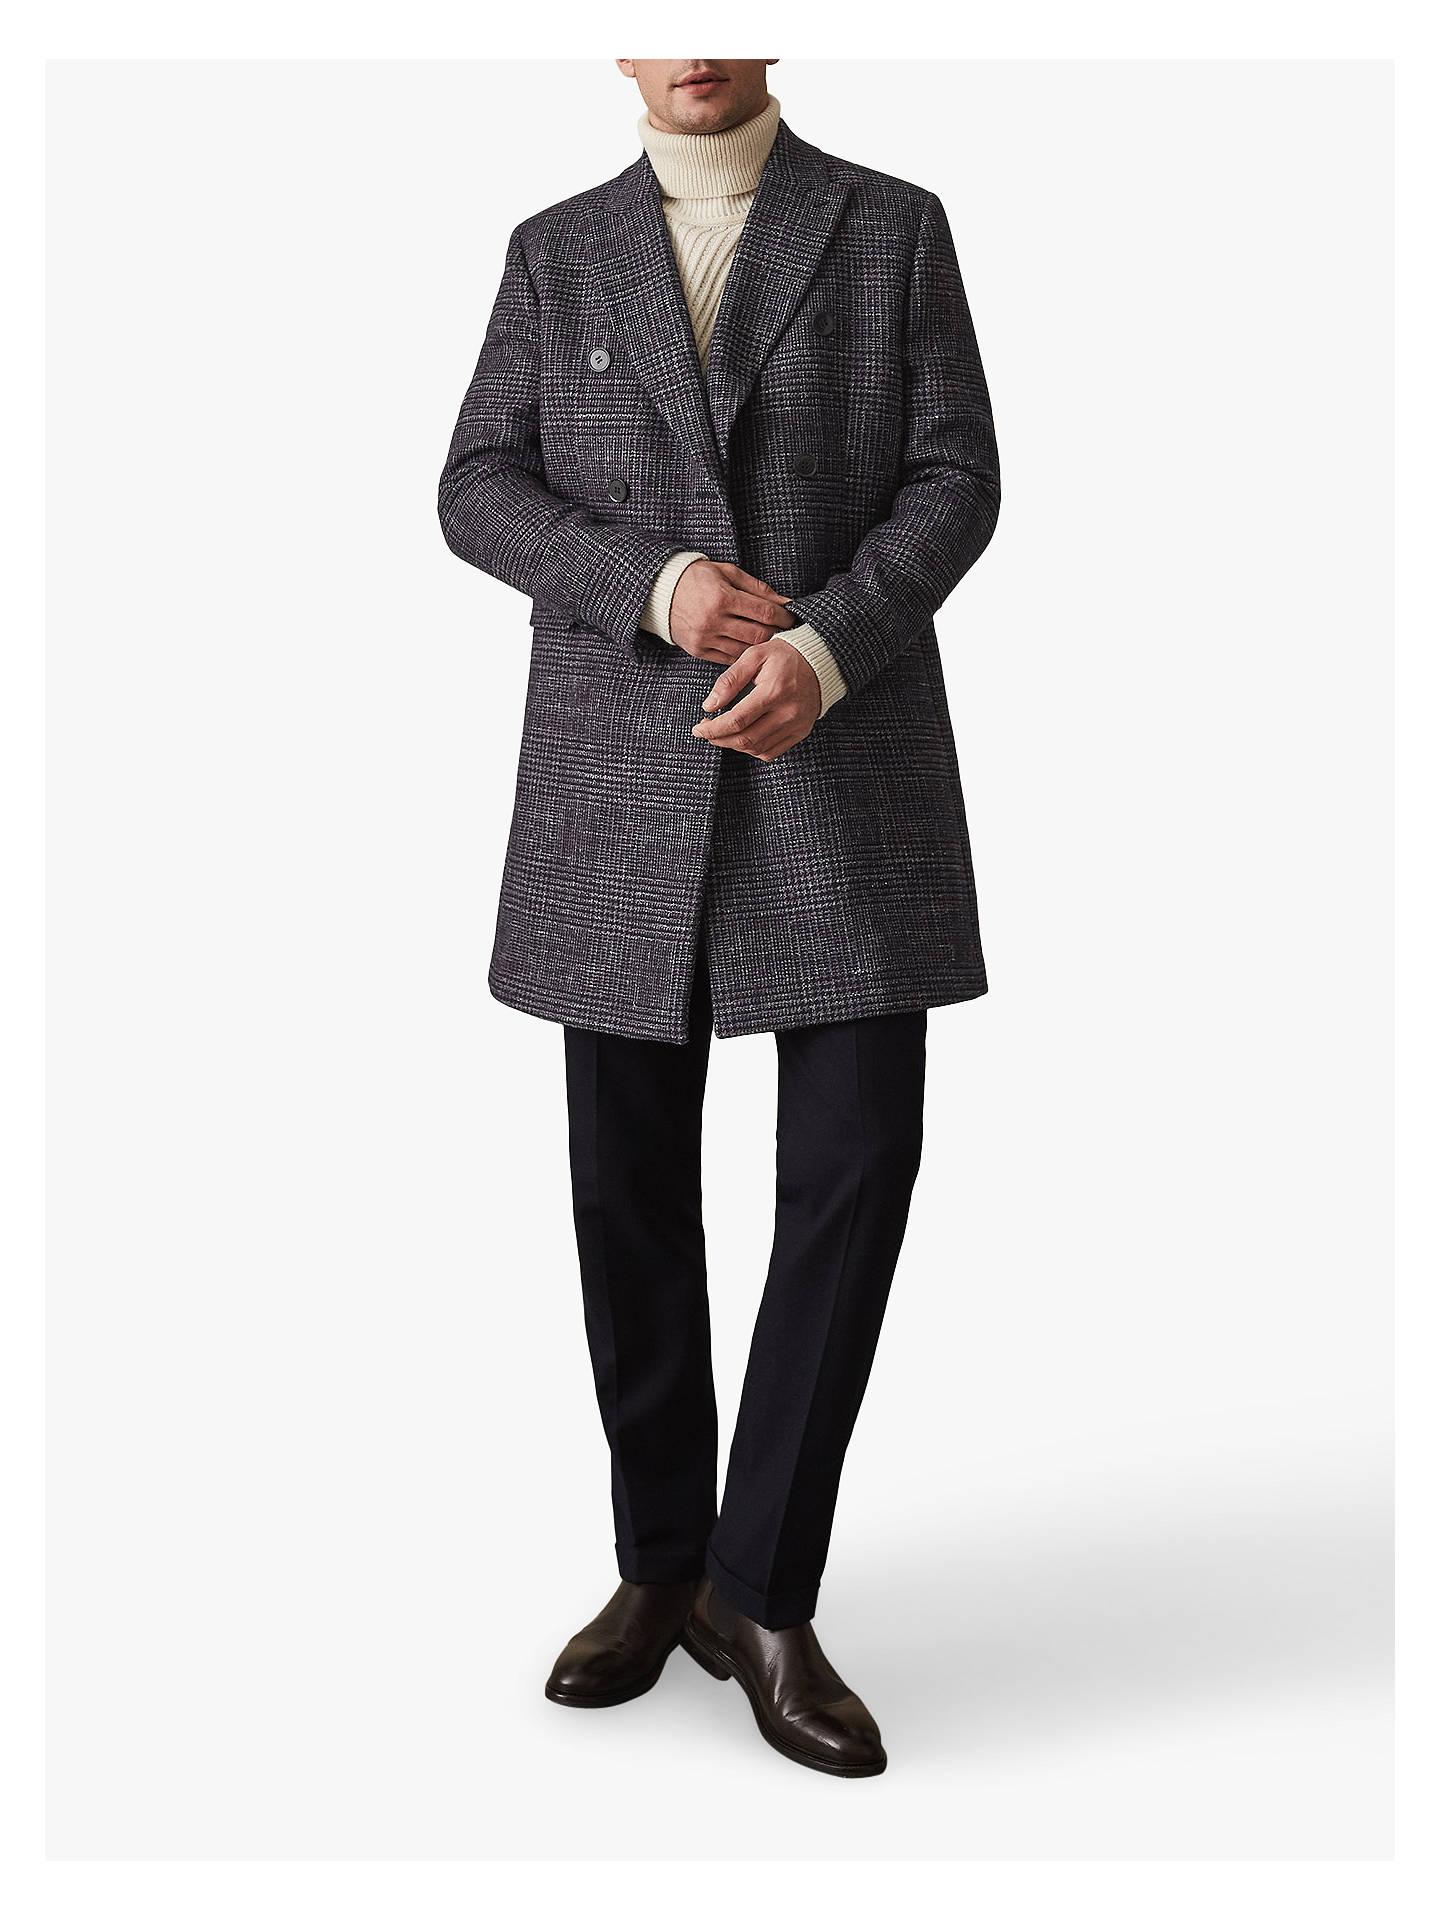 S REISS Men/'s Black Francisco Cashmere Blend Double Breasted Coat L XL M